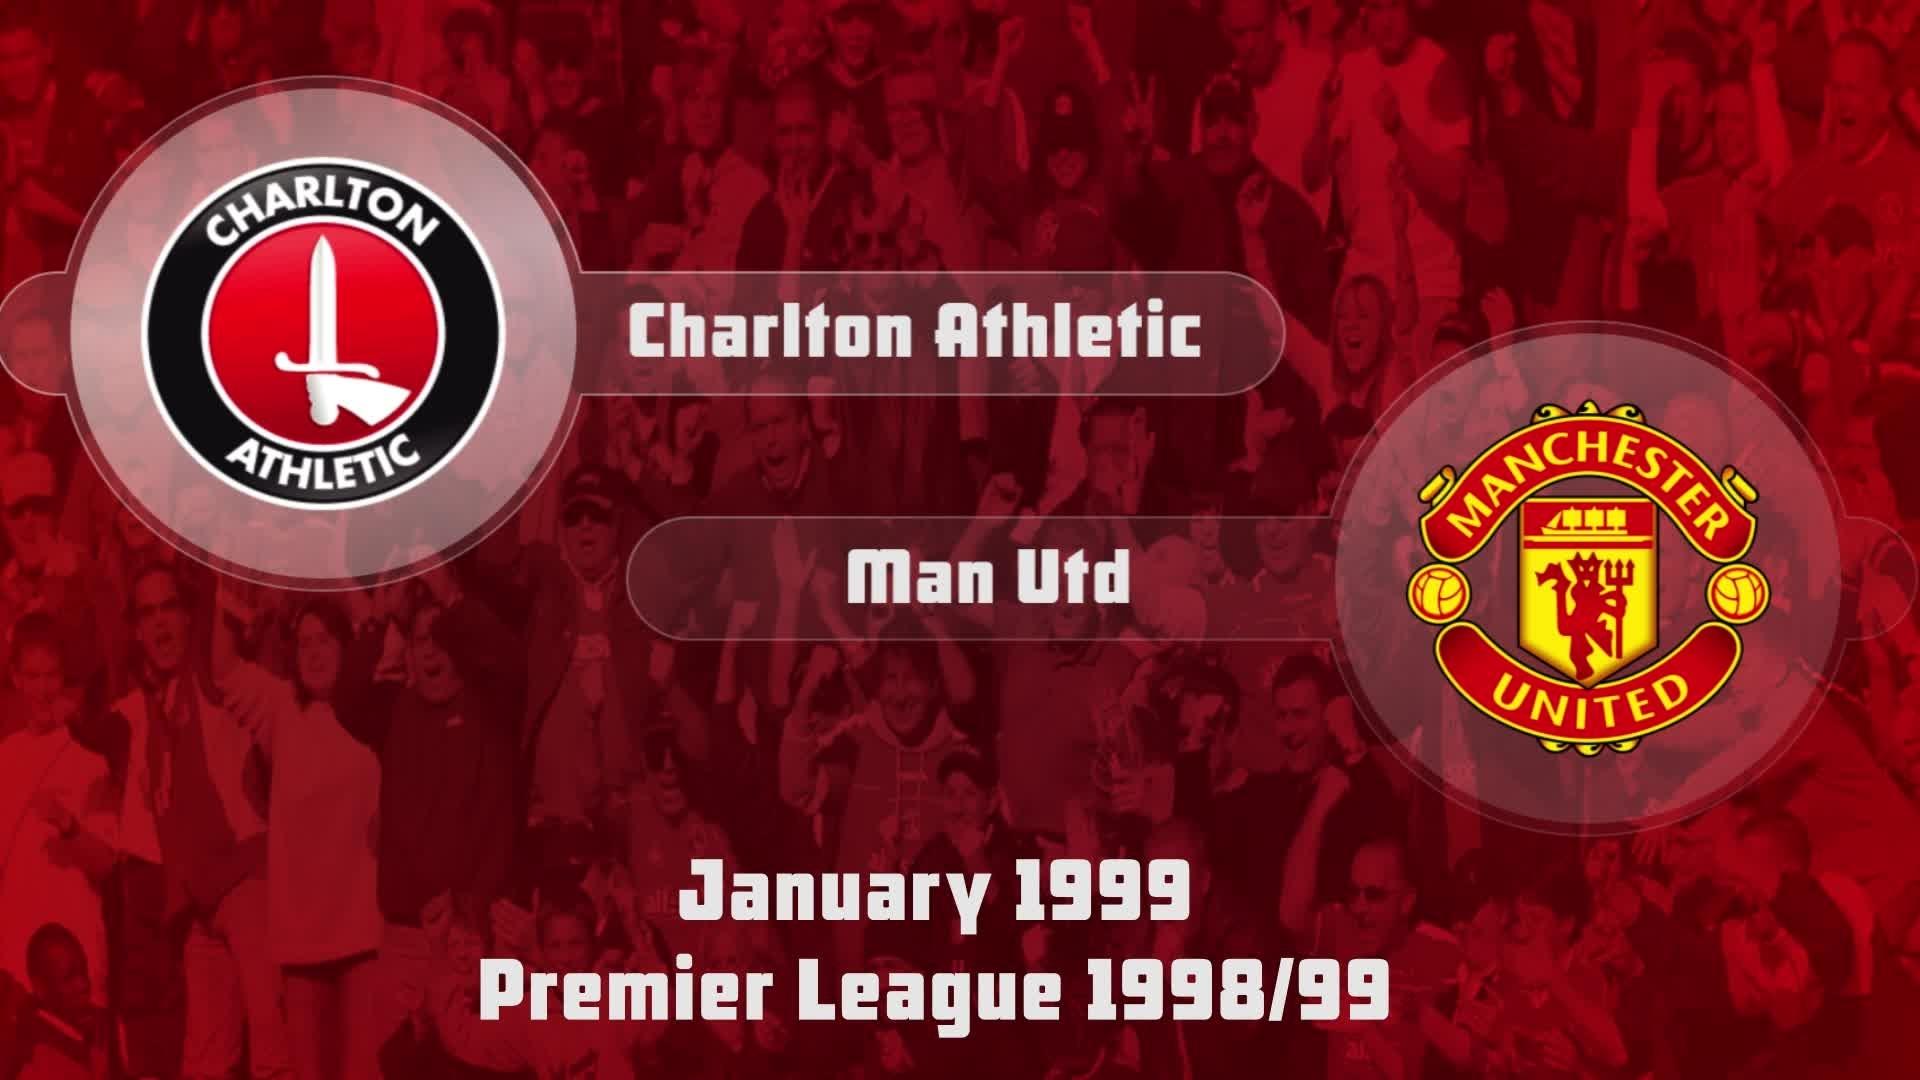 27 HIGHLIGHTS | Charlton 0 Man Utd 1 (Jan 1999)